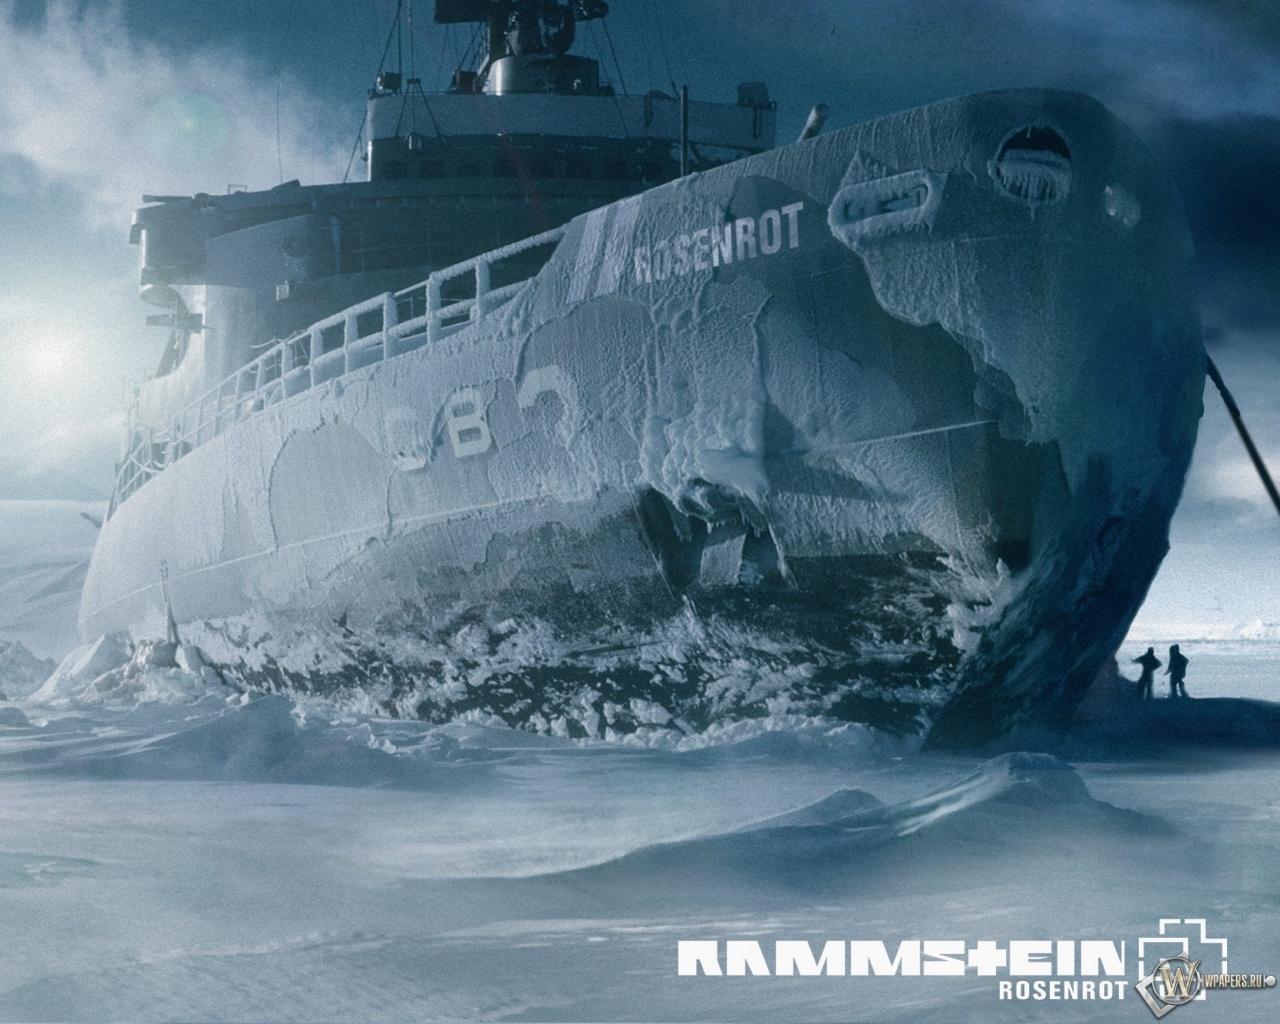 Скачать обои Rammstein Rosenrot (Лёд, Корабль, Rammstein) для ...